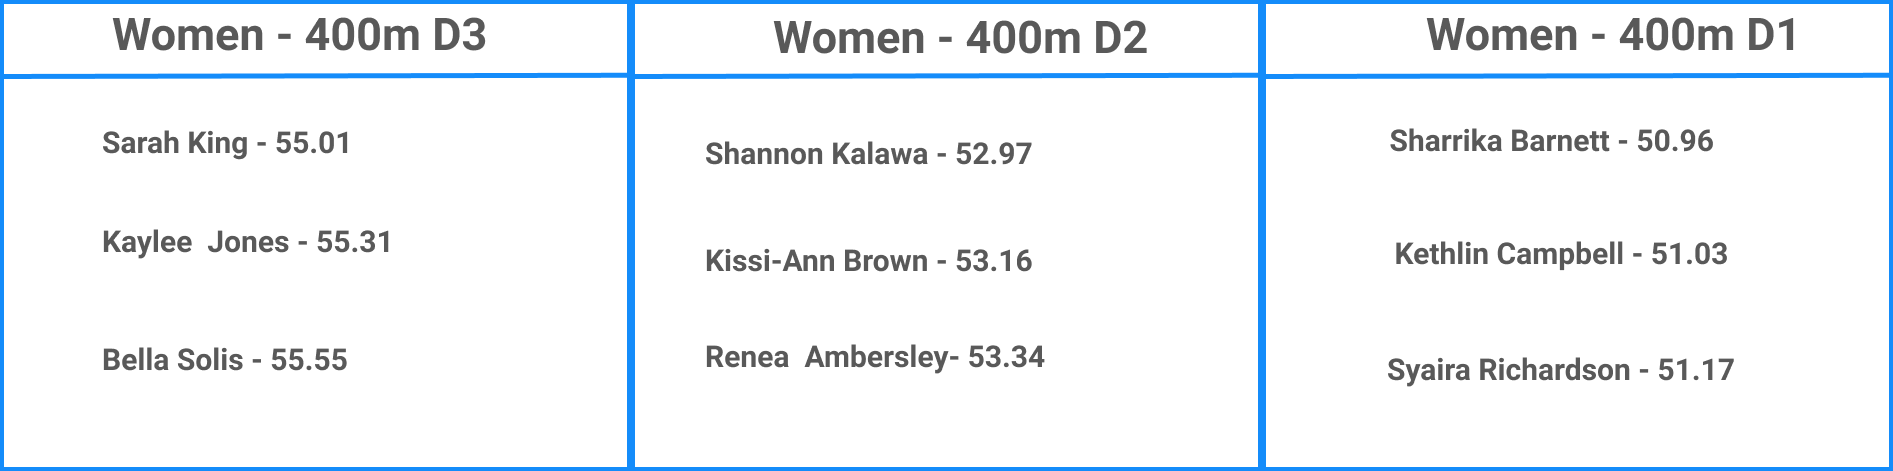 Top NCAA Women's 400m Performances